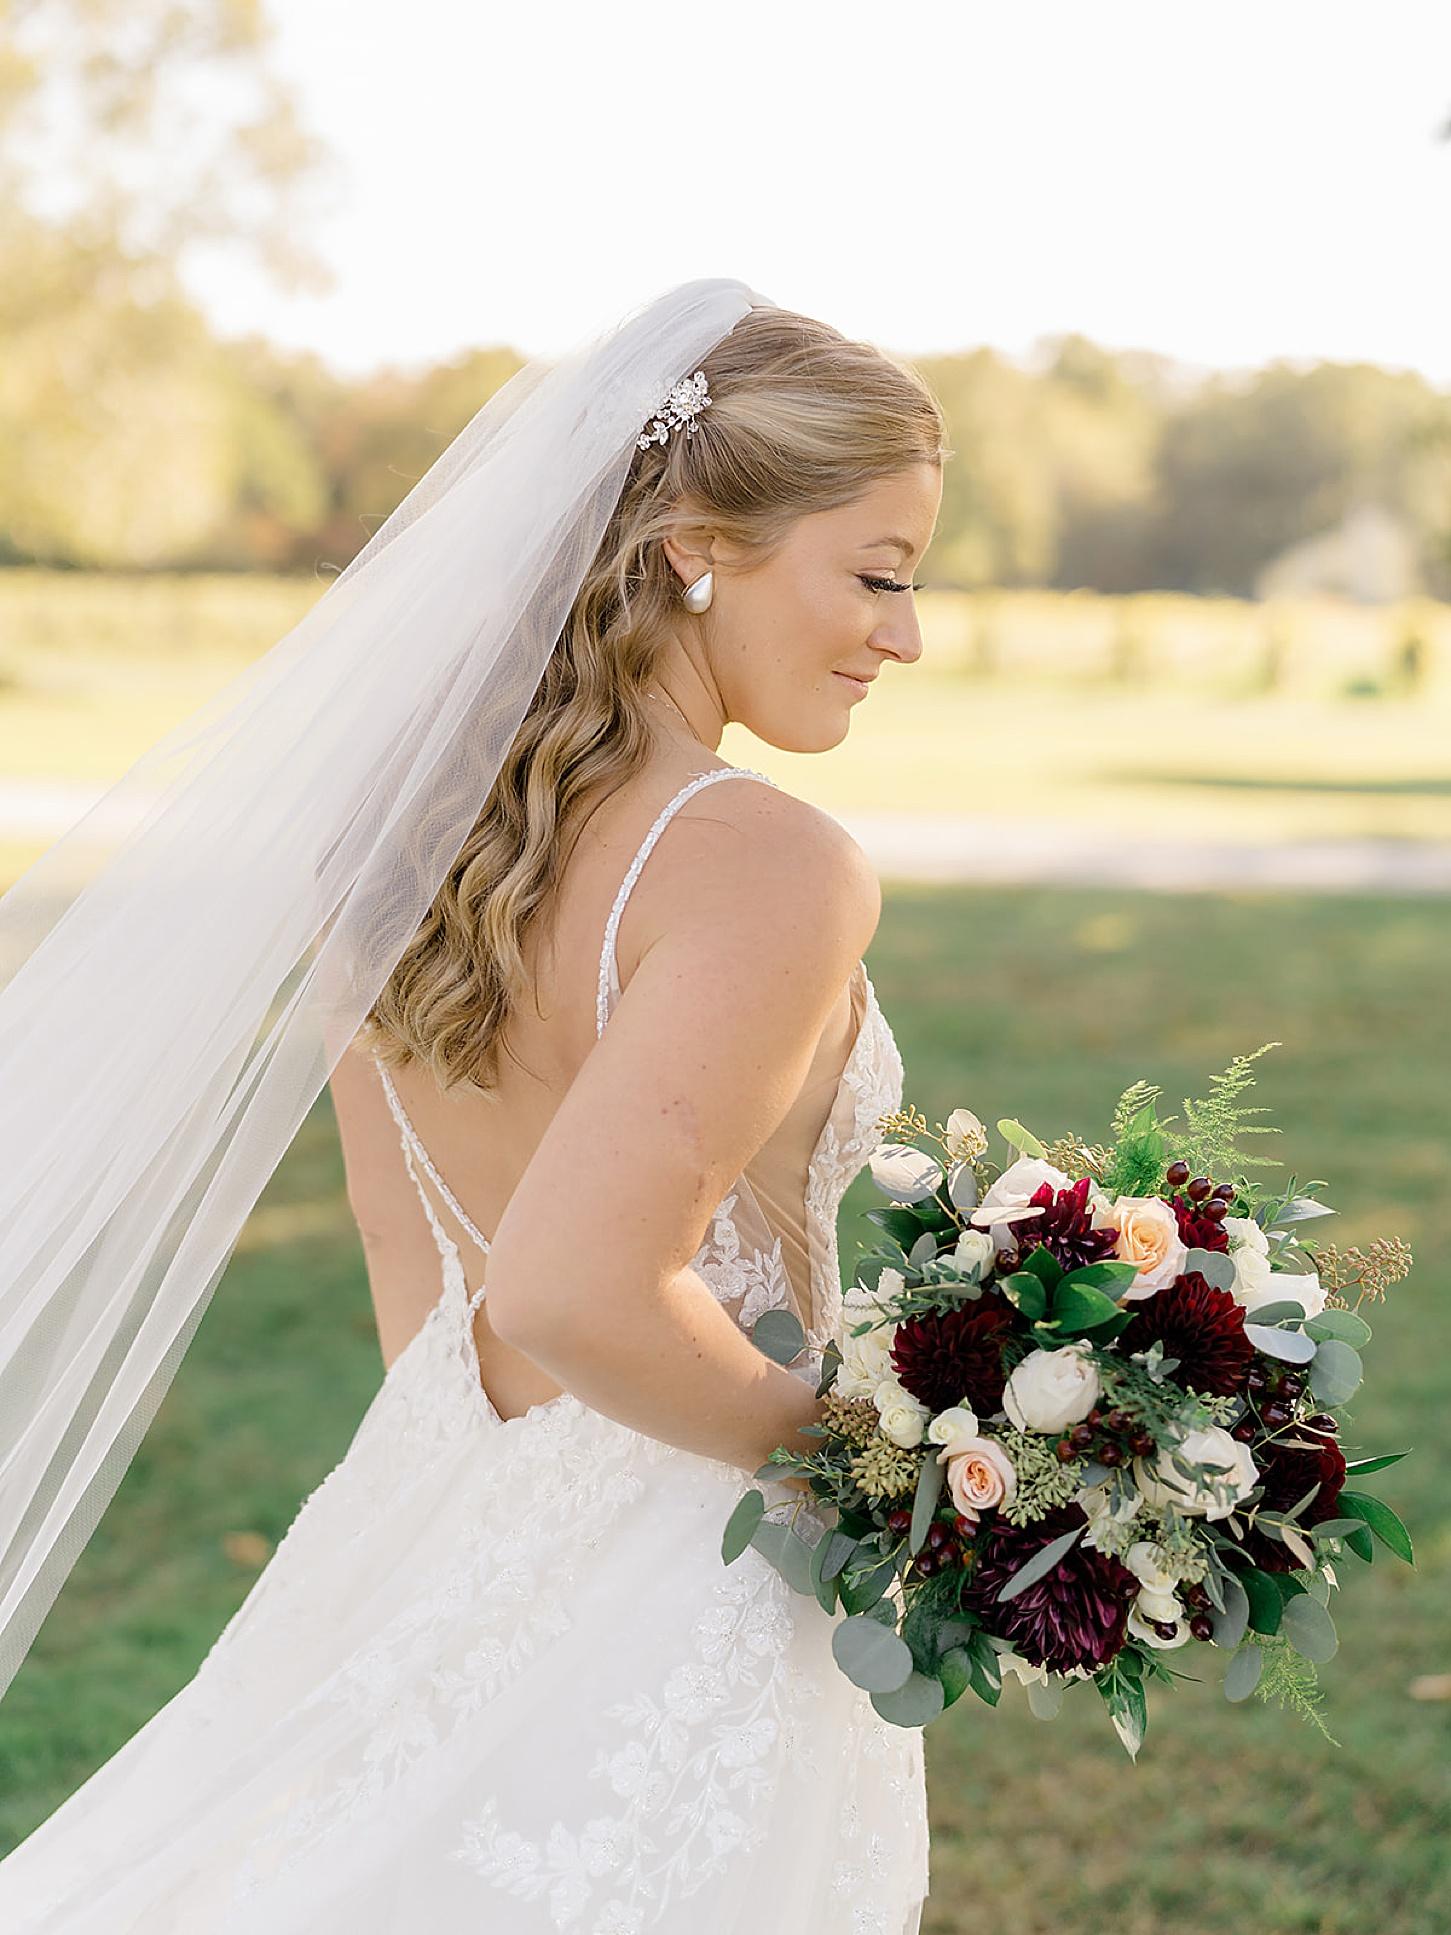 Valenzano Winery Vitners Pavillion Wedding Photography by Magdalena Studios 0005